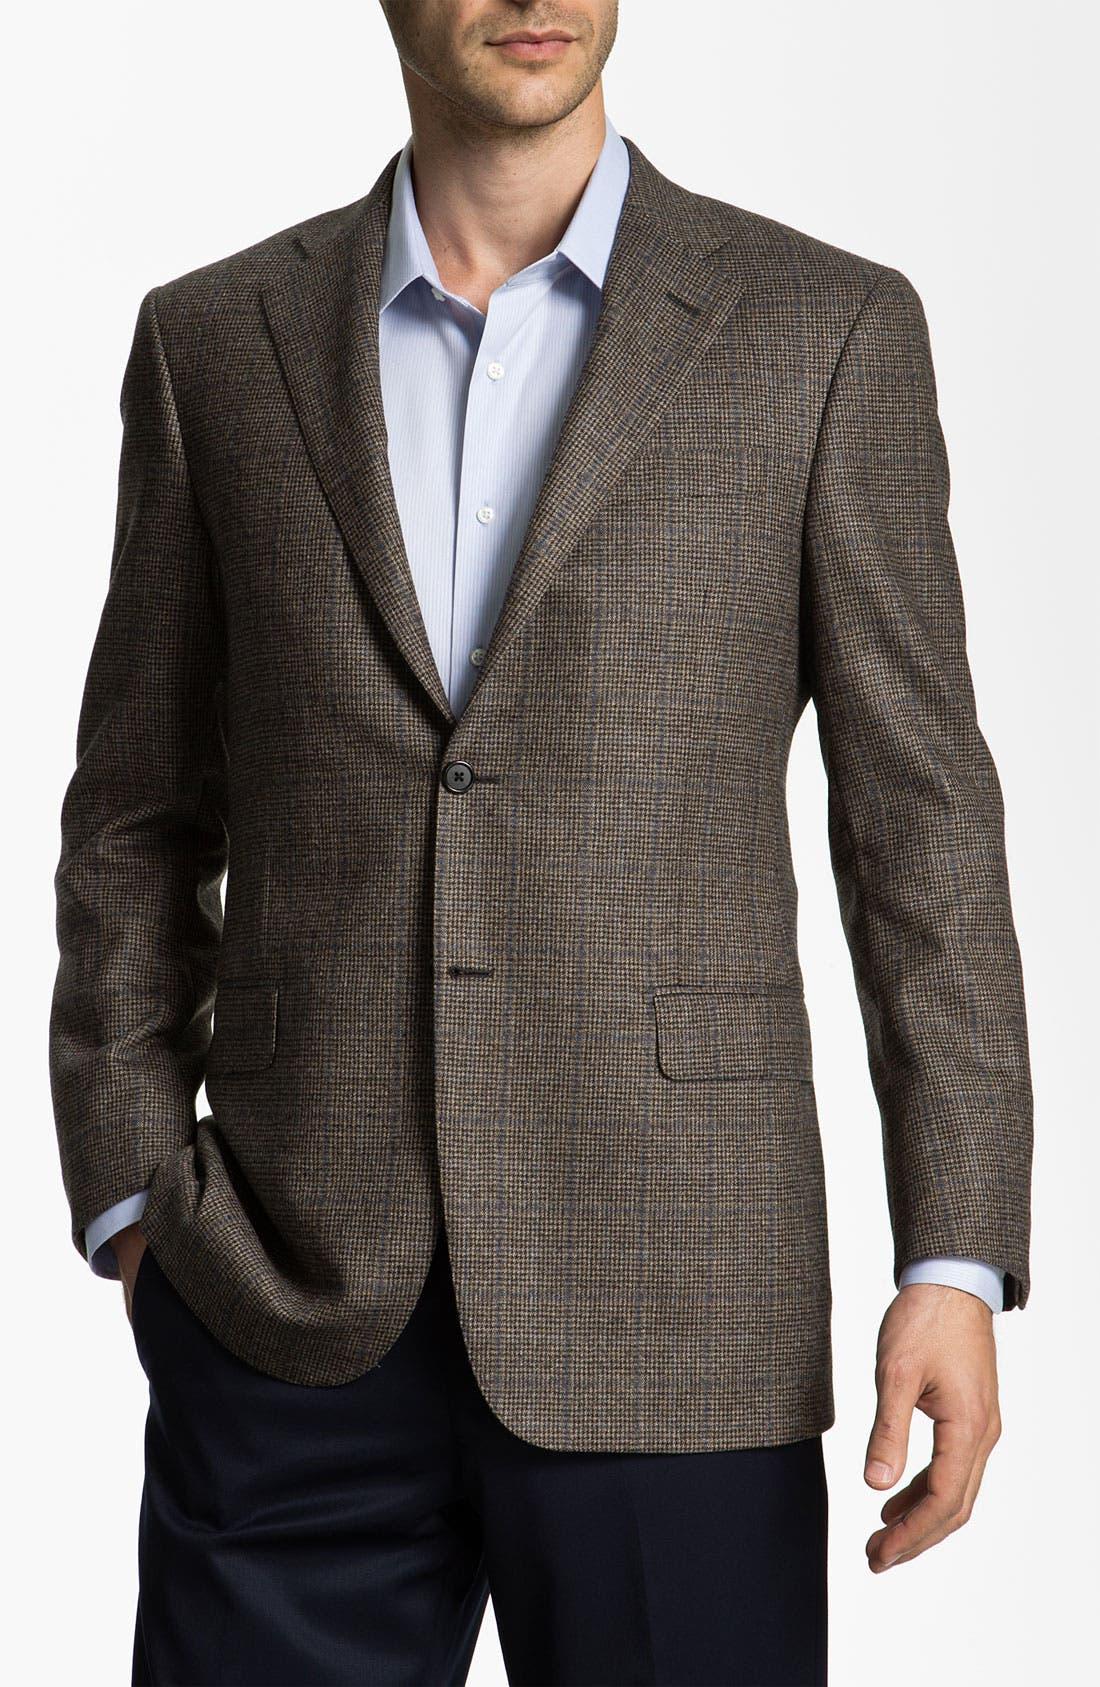 Main Image - Hickey Freeman Plaid Sportcoat